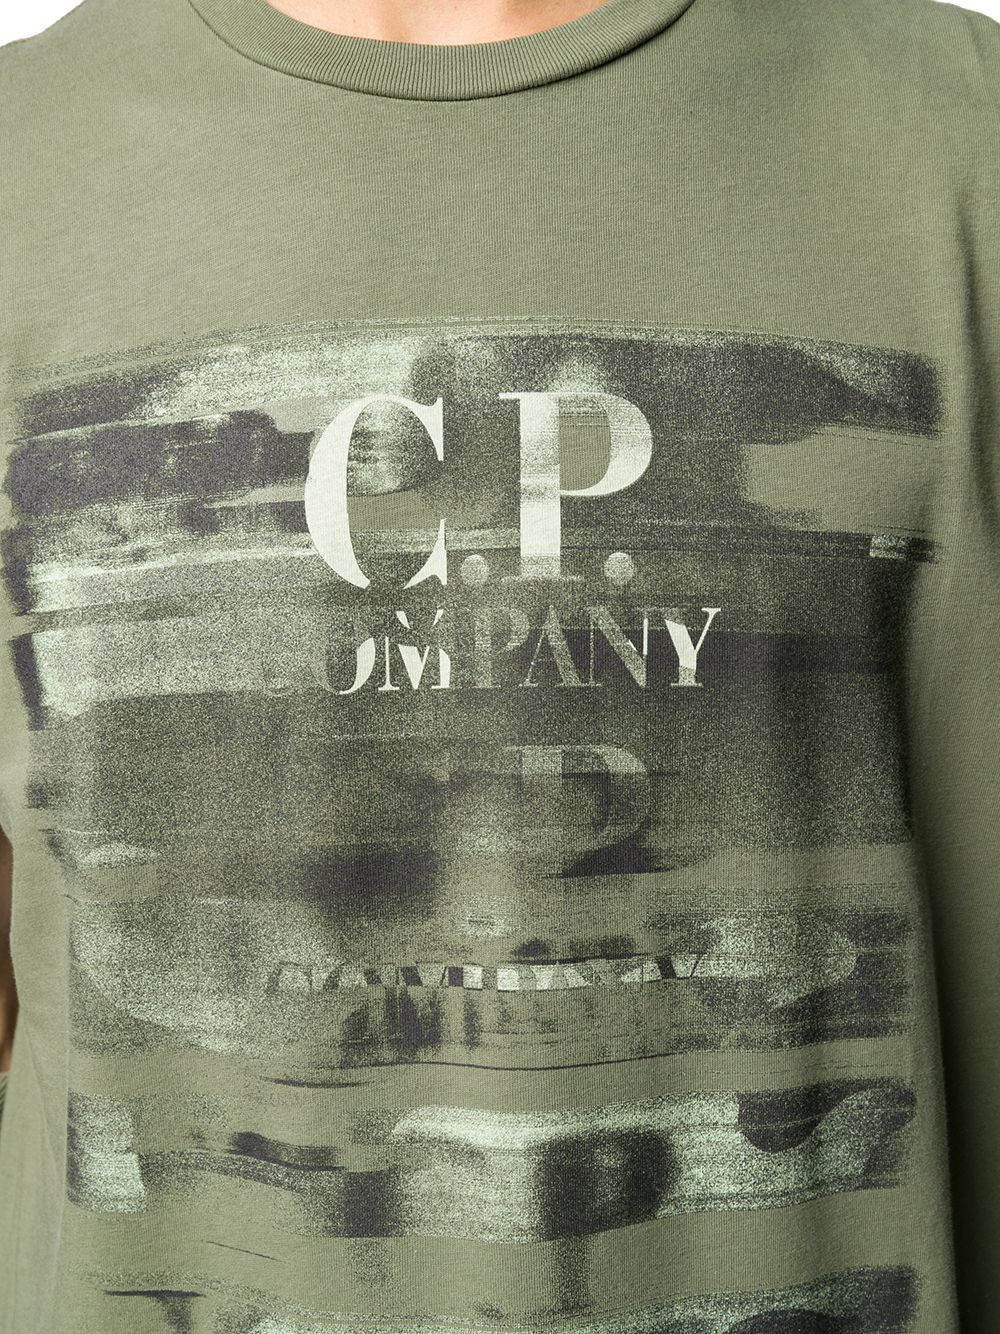 CP COMPANY MEN'S 08CMTS336A005621W660 GREEN COTTON T-SHIRT